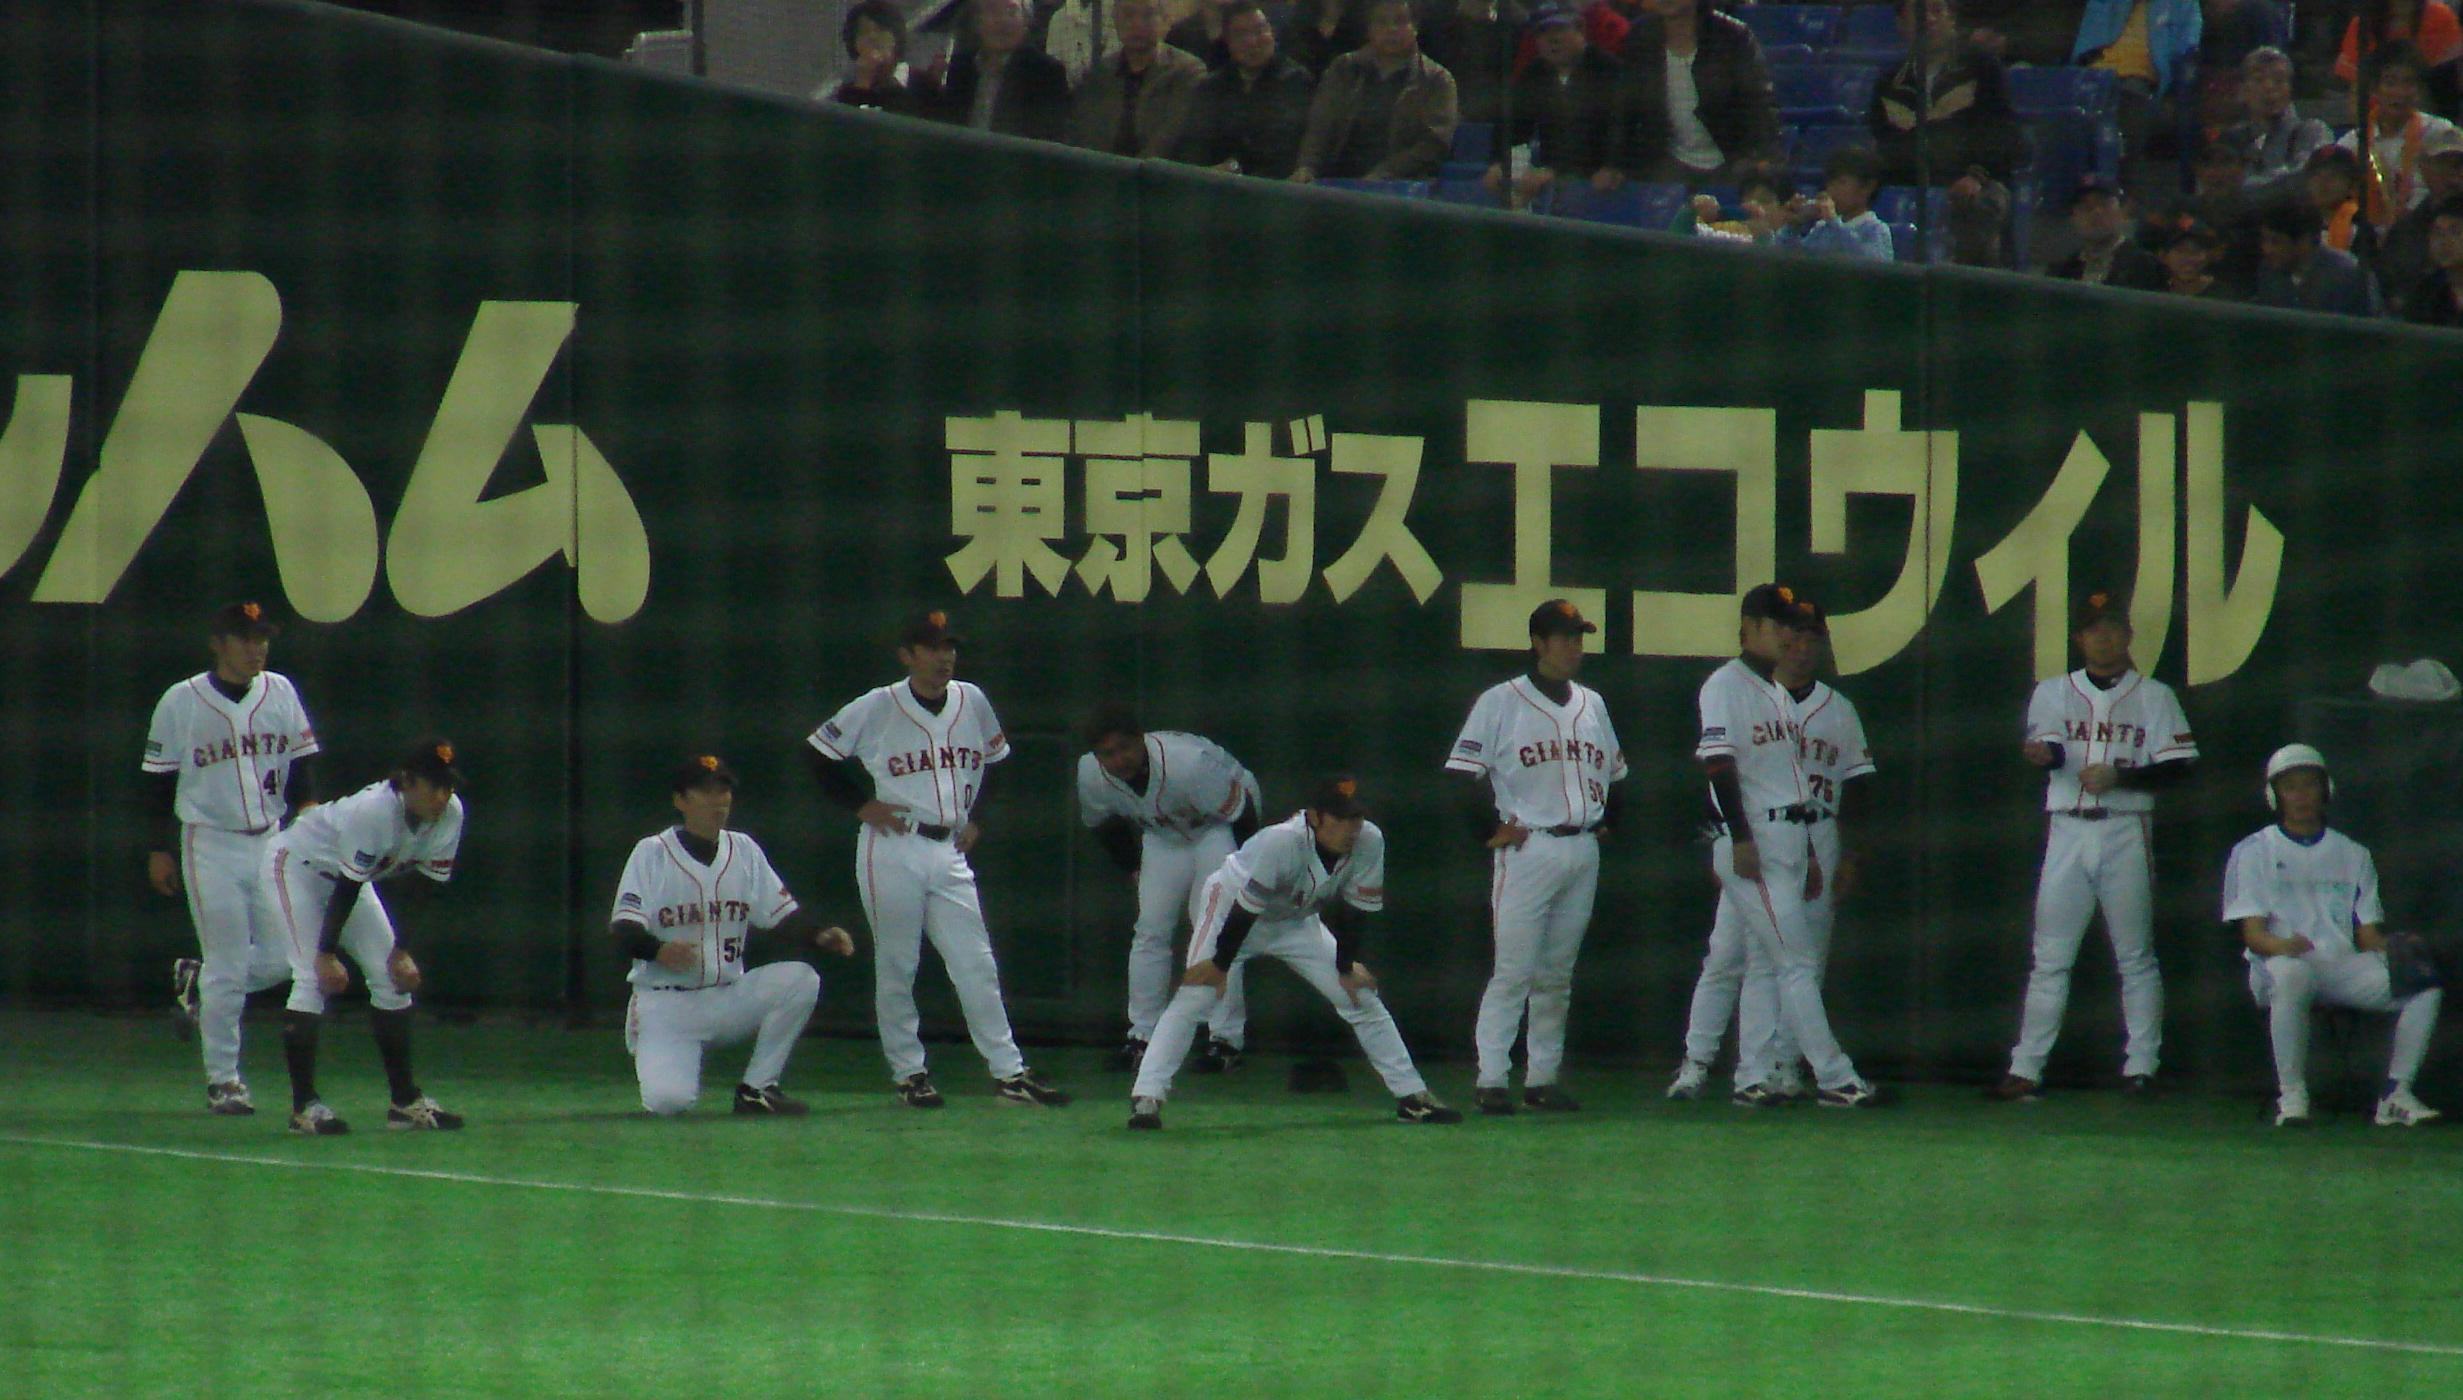 japan-trip-16.jpg